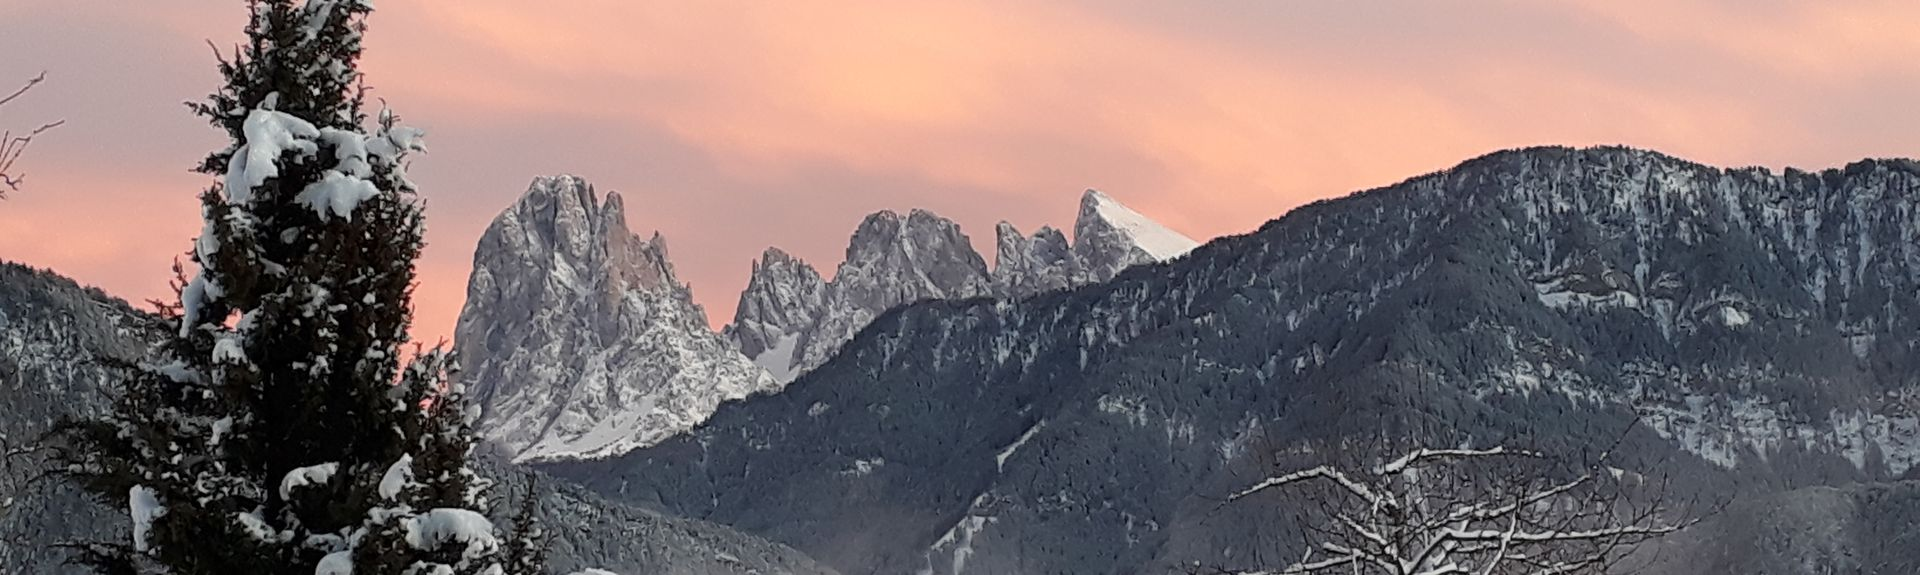 Laion, Laion, Trentino Alto Adige, Italia